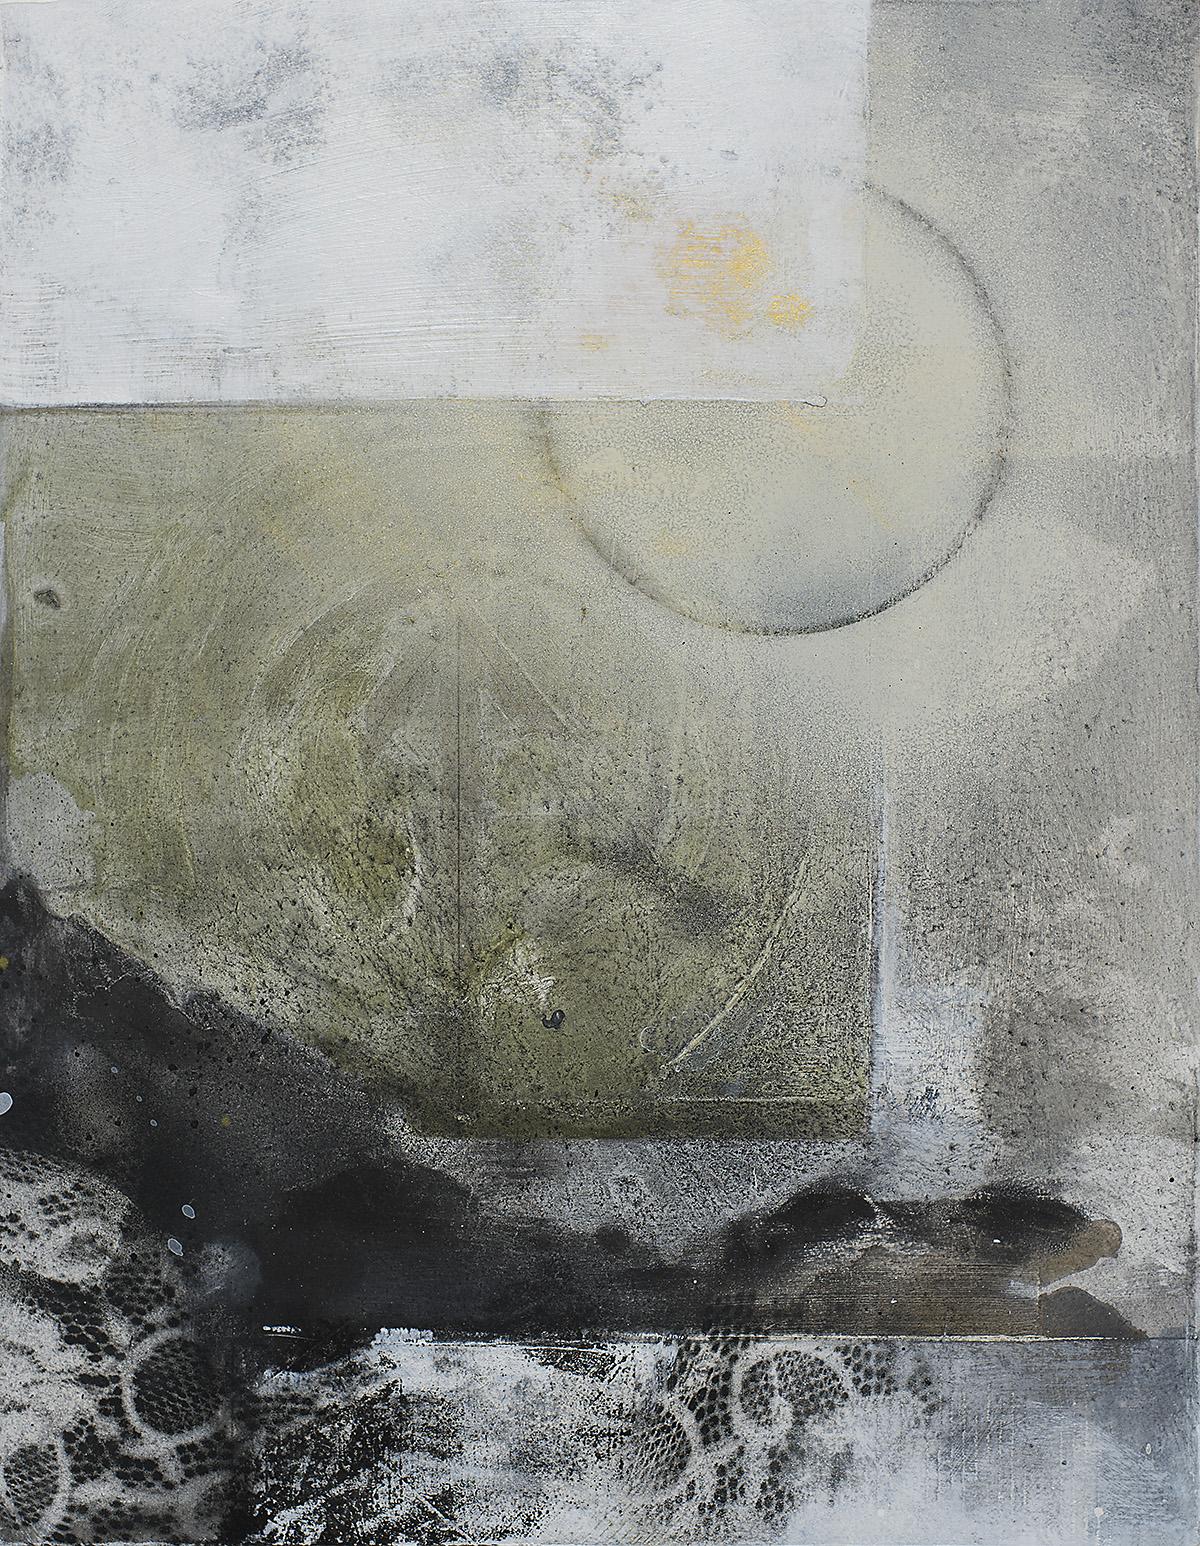 16 Noches oleo, tinta y pigmentos s/madera 45 x 35 cms